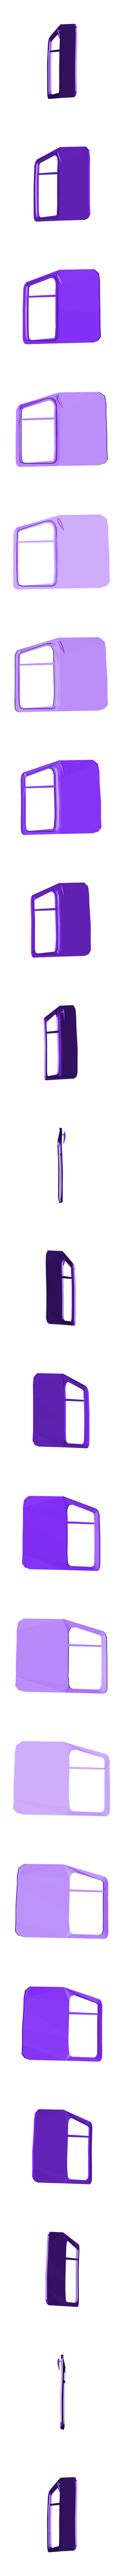 DT - дверь.stl Download free STL file RC Soviet tractor DT-75 Kazakhstan (1\10 scale) • 3D printer design, gamebox13